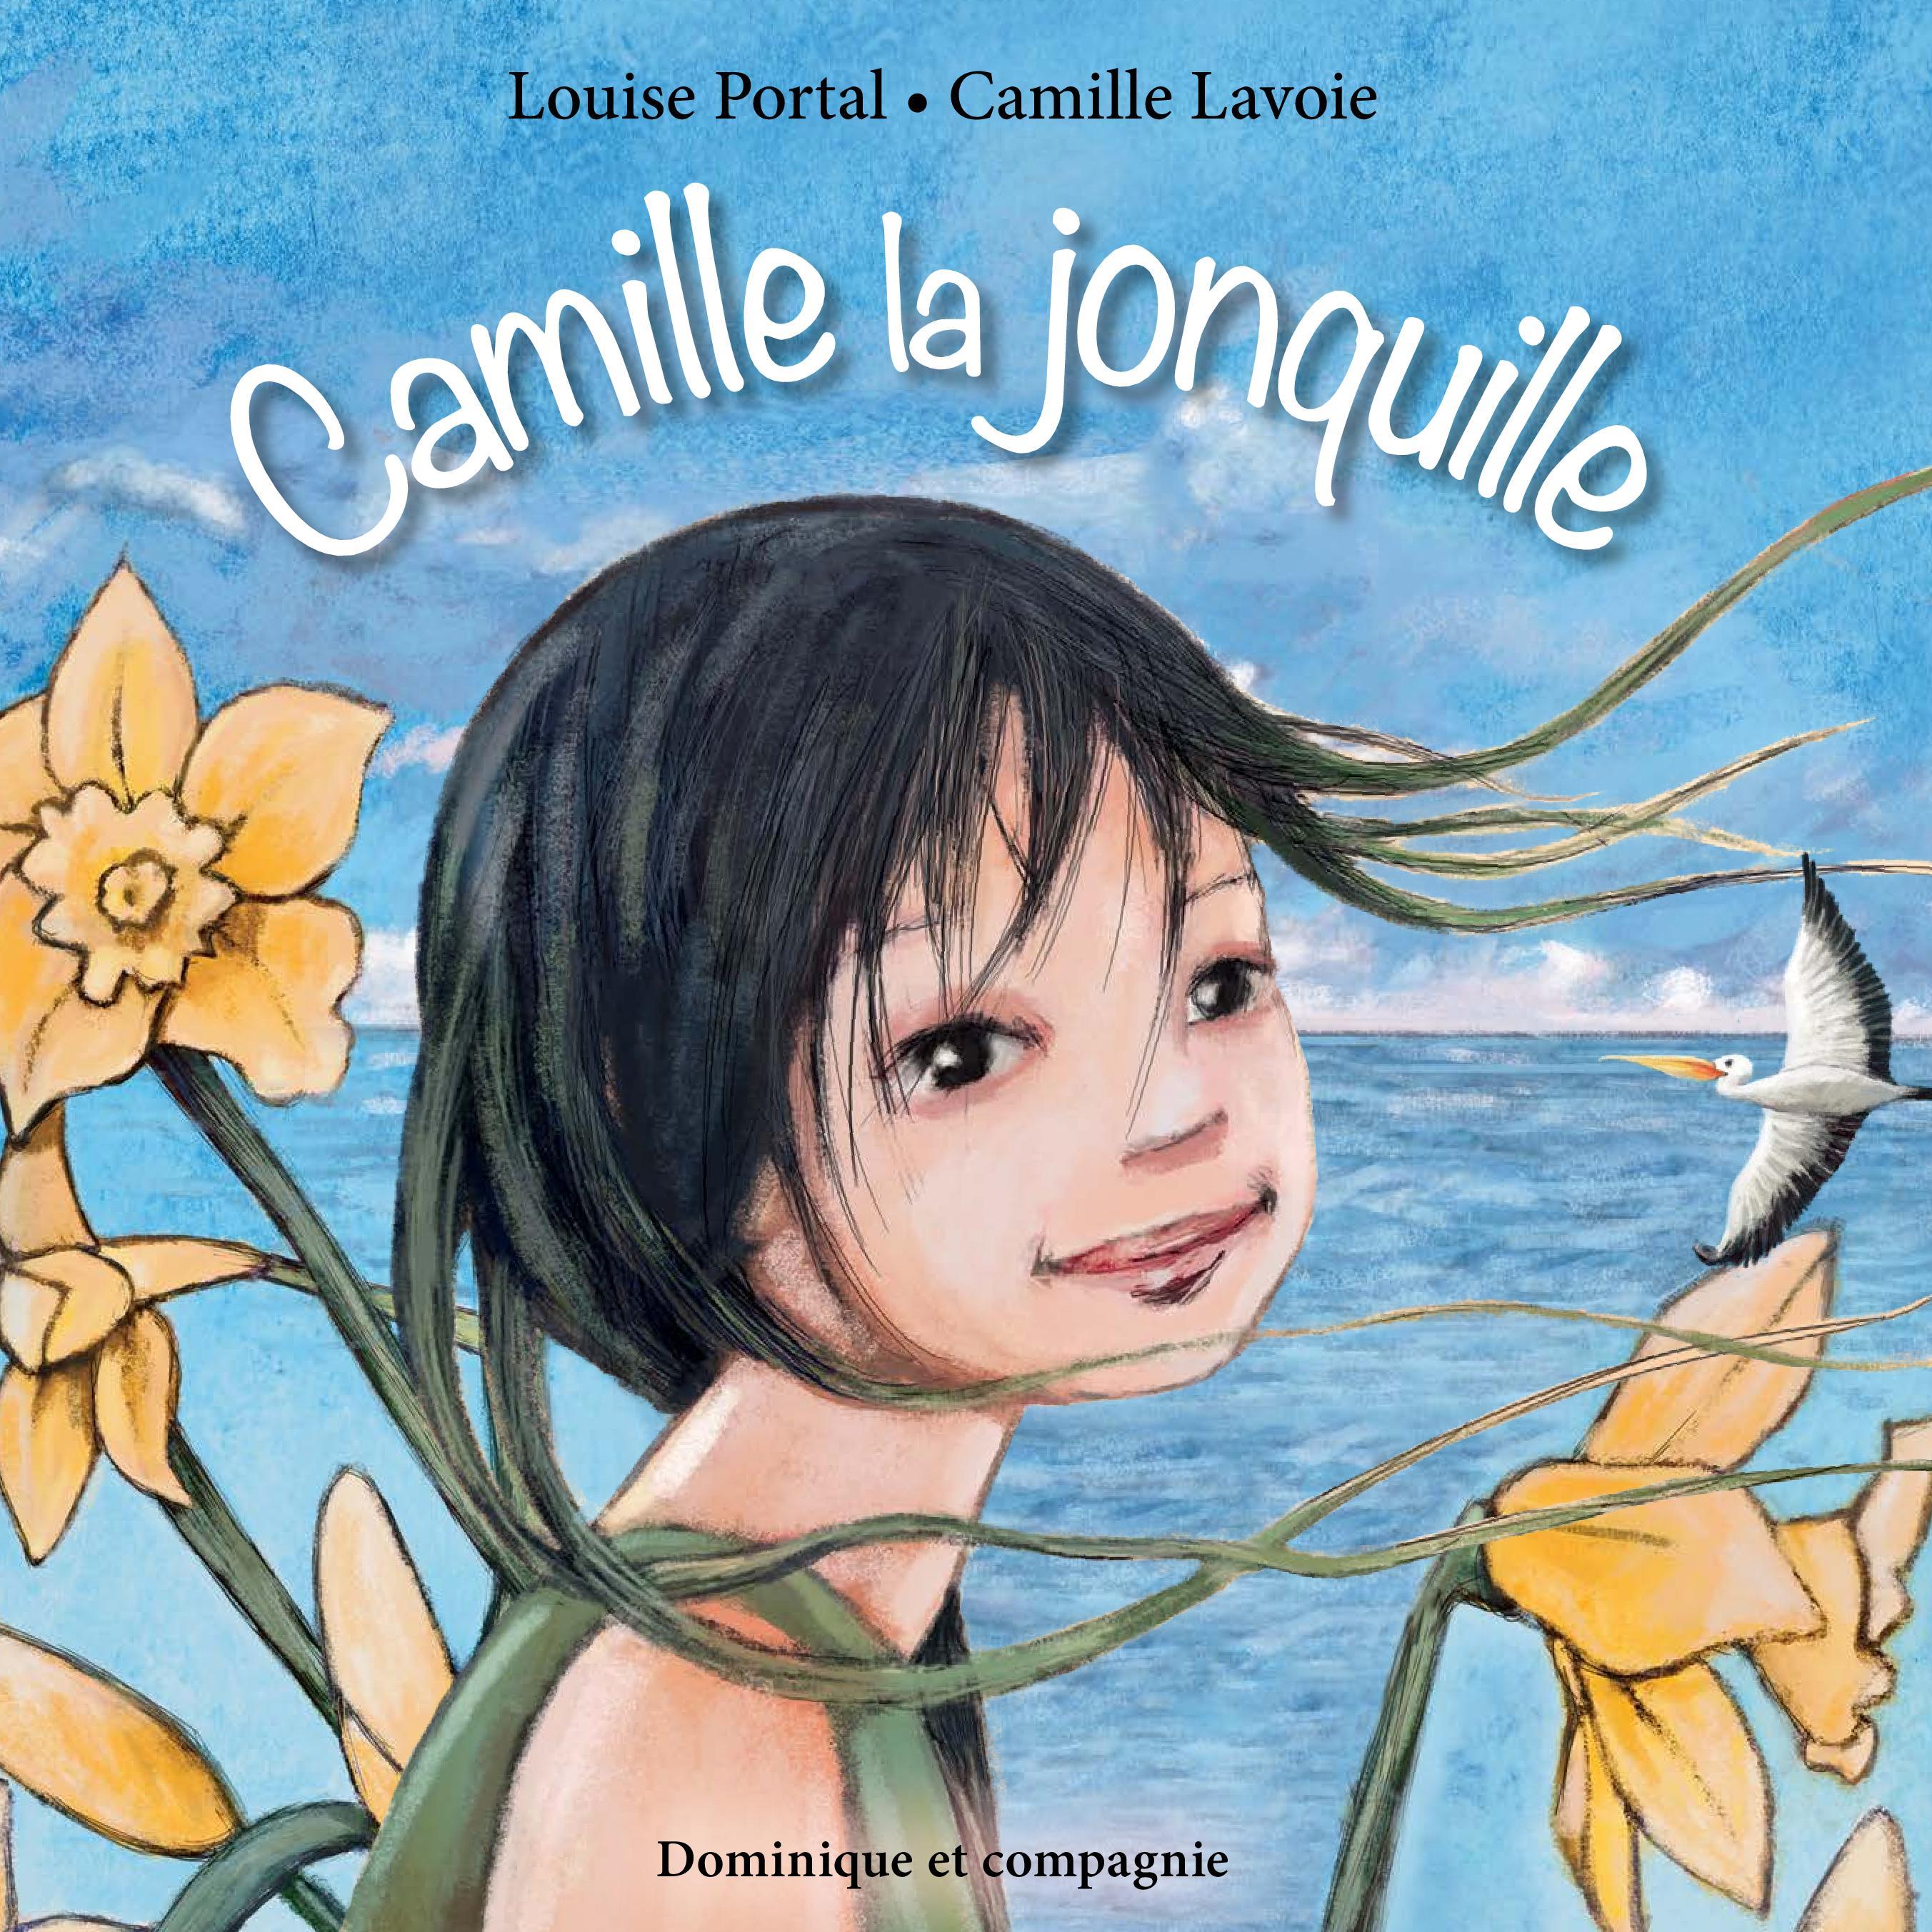 Camille la jonquille